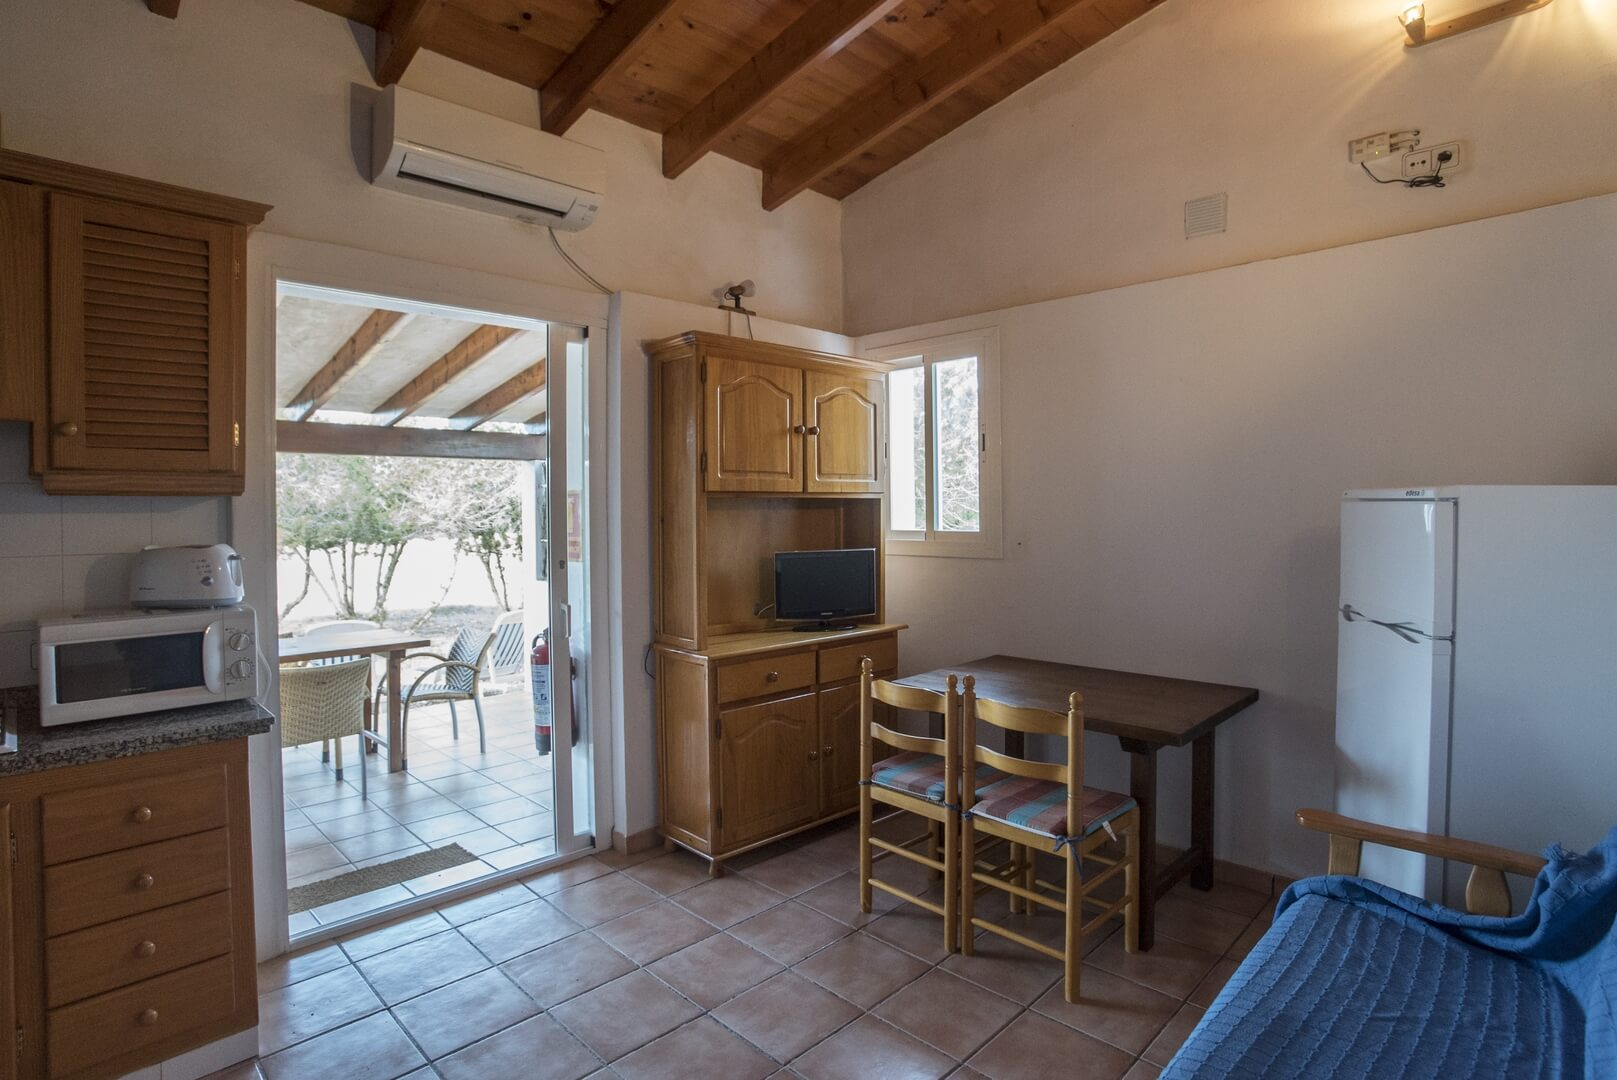 Casa Alquiler Formentera. Casa Patricia 3. Cala Saona